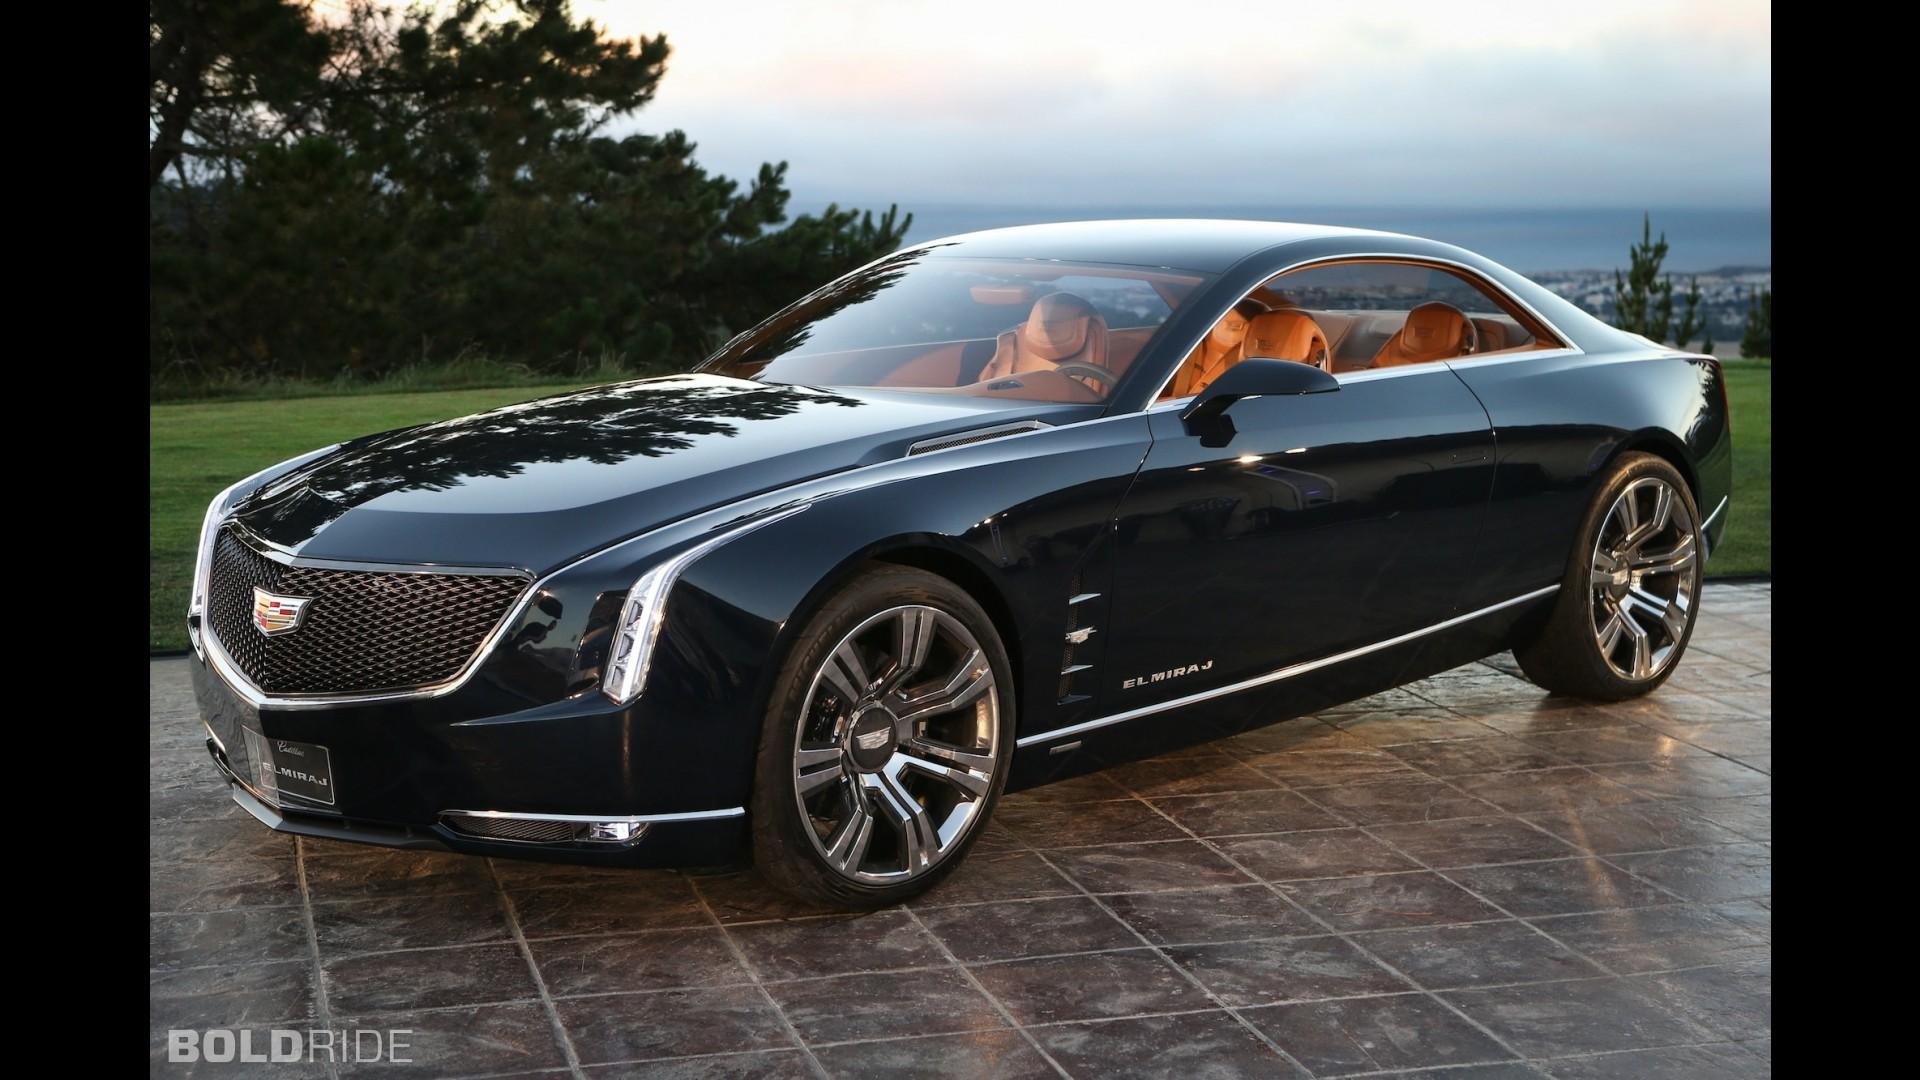 Cadillac Elmiraj Price In Usa >> Cadillac Elmiraj Concept